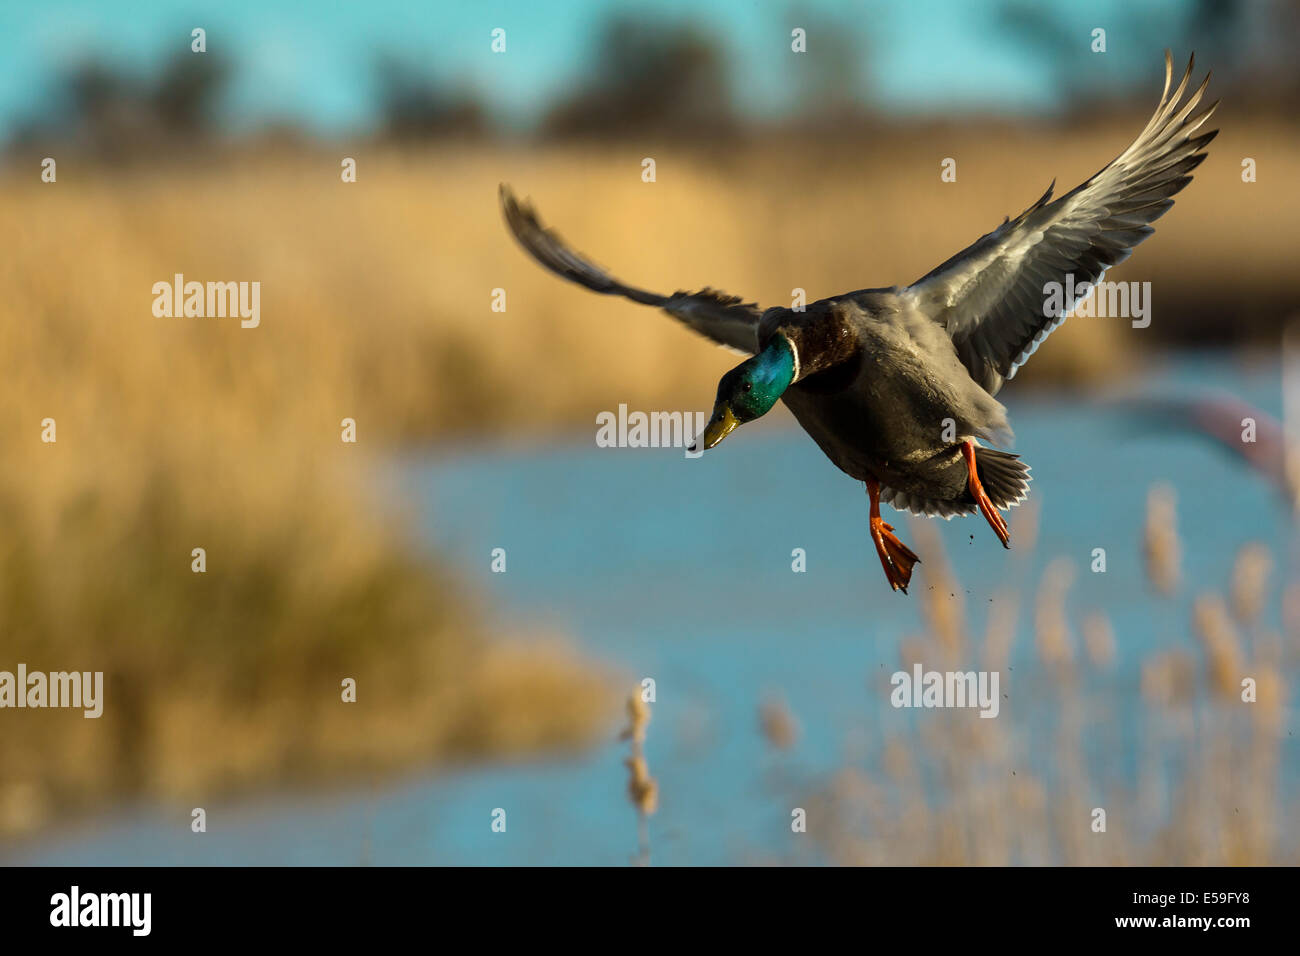 Wild Duck, Anas platyrhynchos - Stock Image